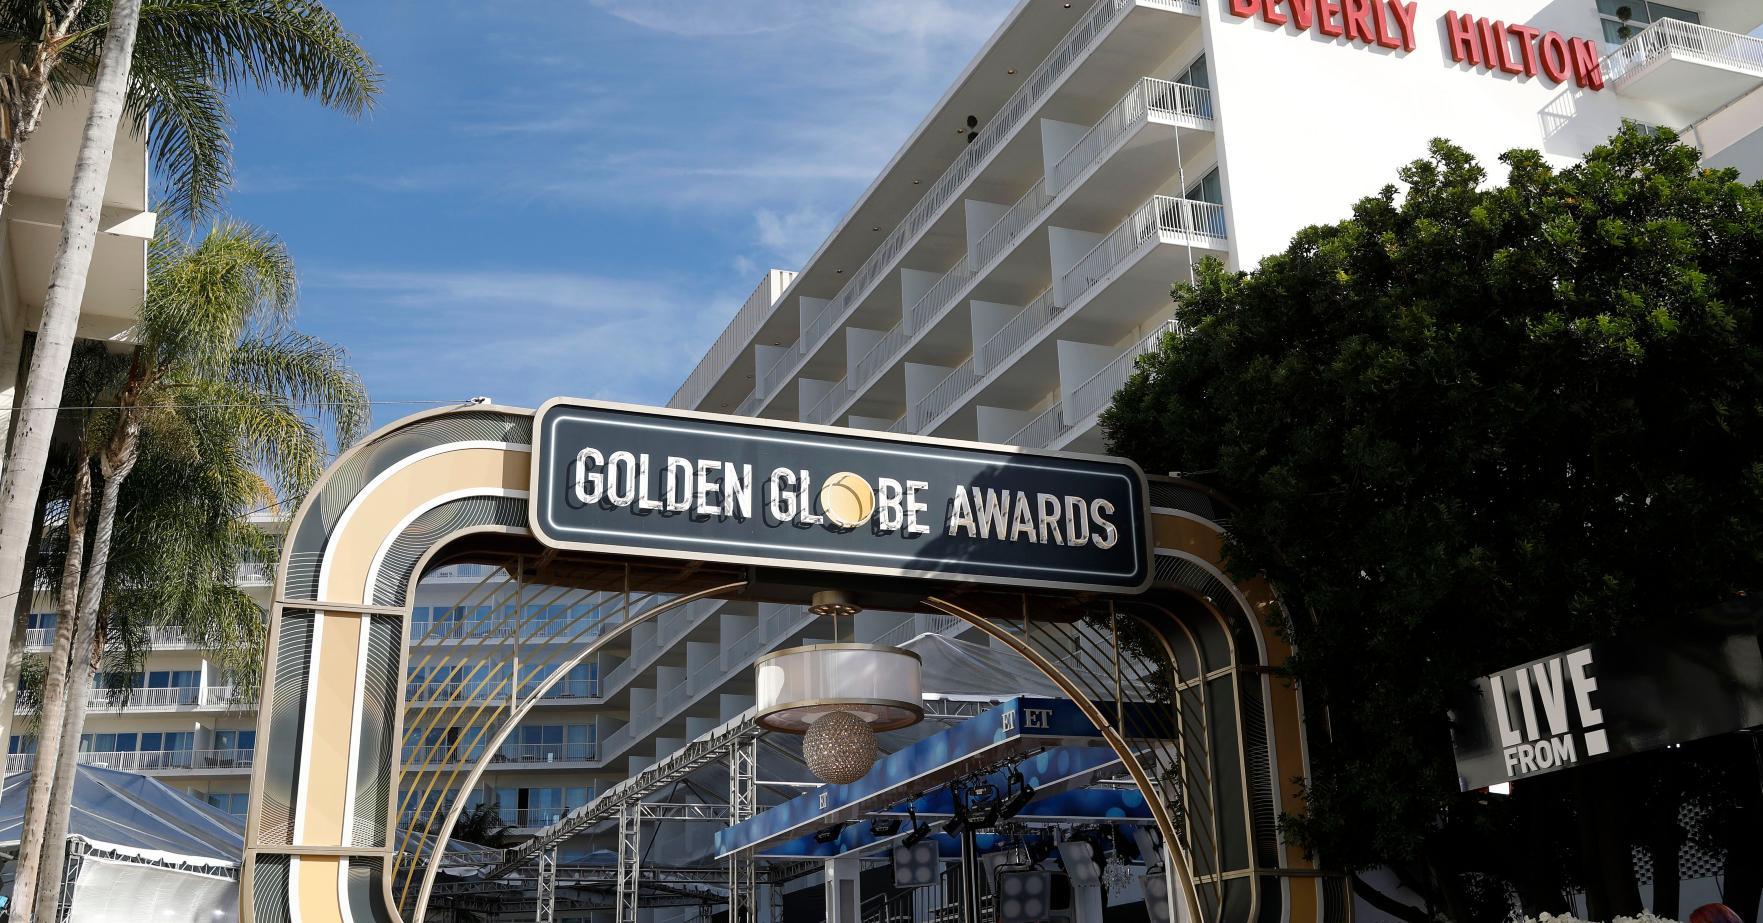 golden globes 2021 - photo #15